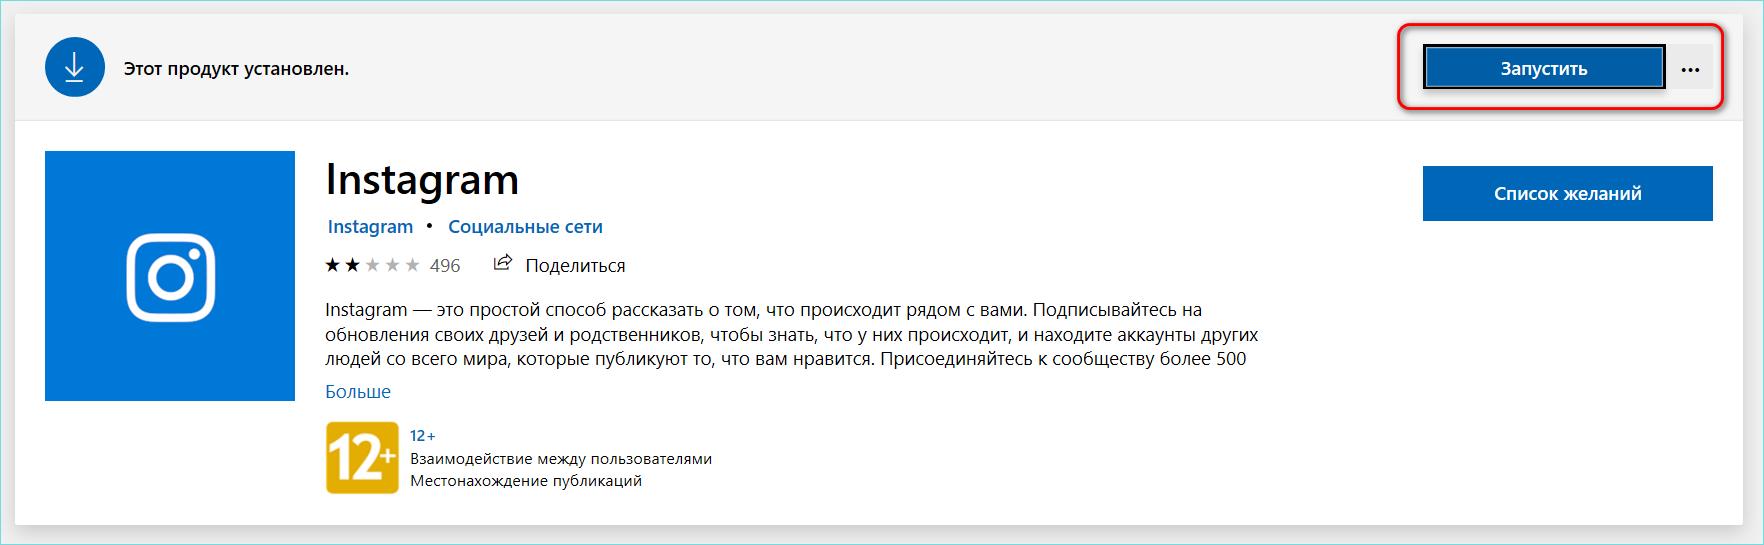 Запуск Инстаграм через Microsoft Store